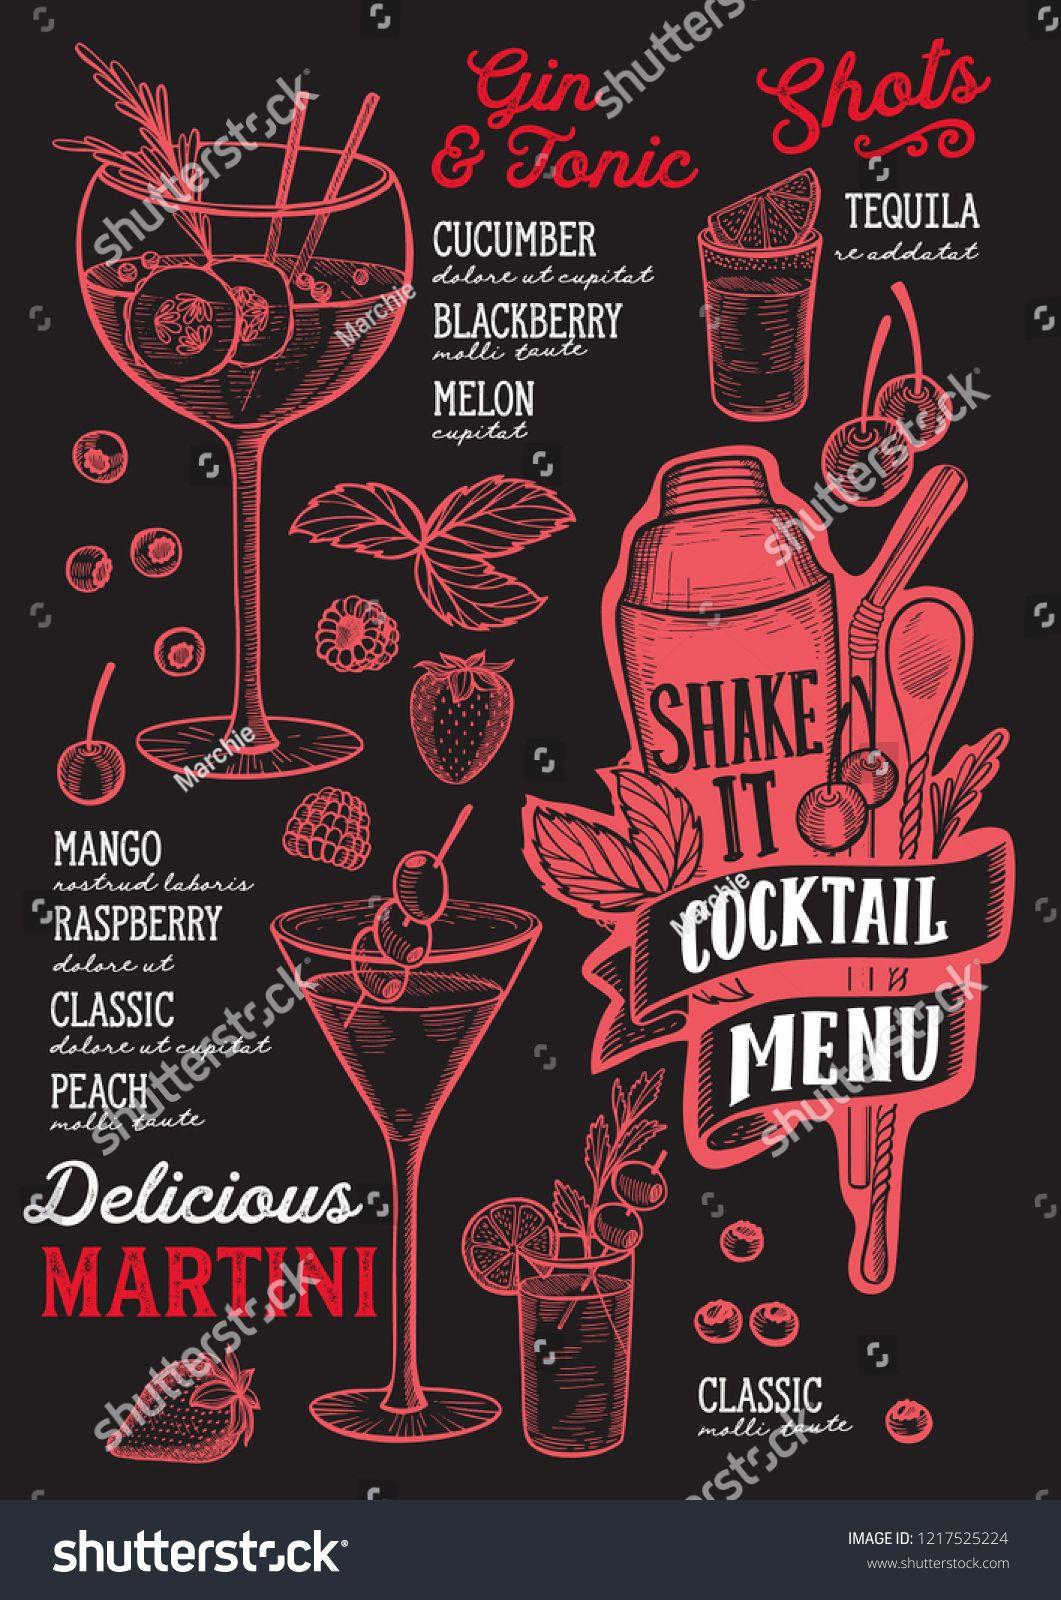 Cocktail Menu Template For Restaurant On A Blackboard Background Vector Illustration Brochure For Foo Cocktail Menu Restaurant Menu Design Menu Design Template